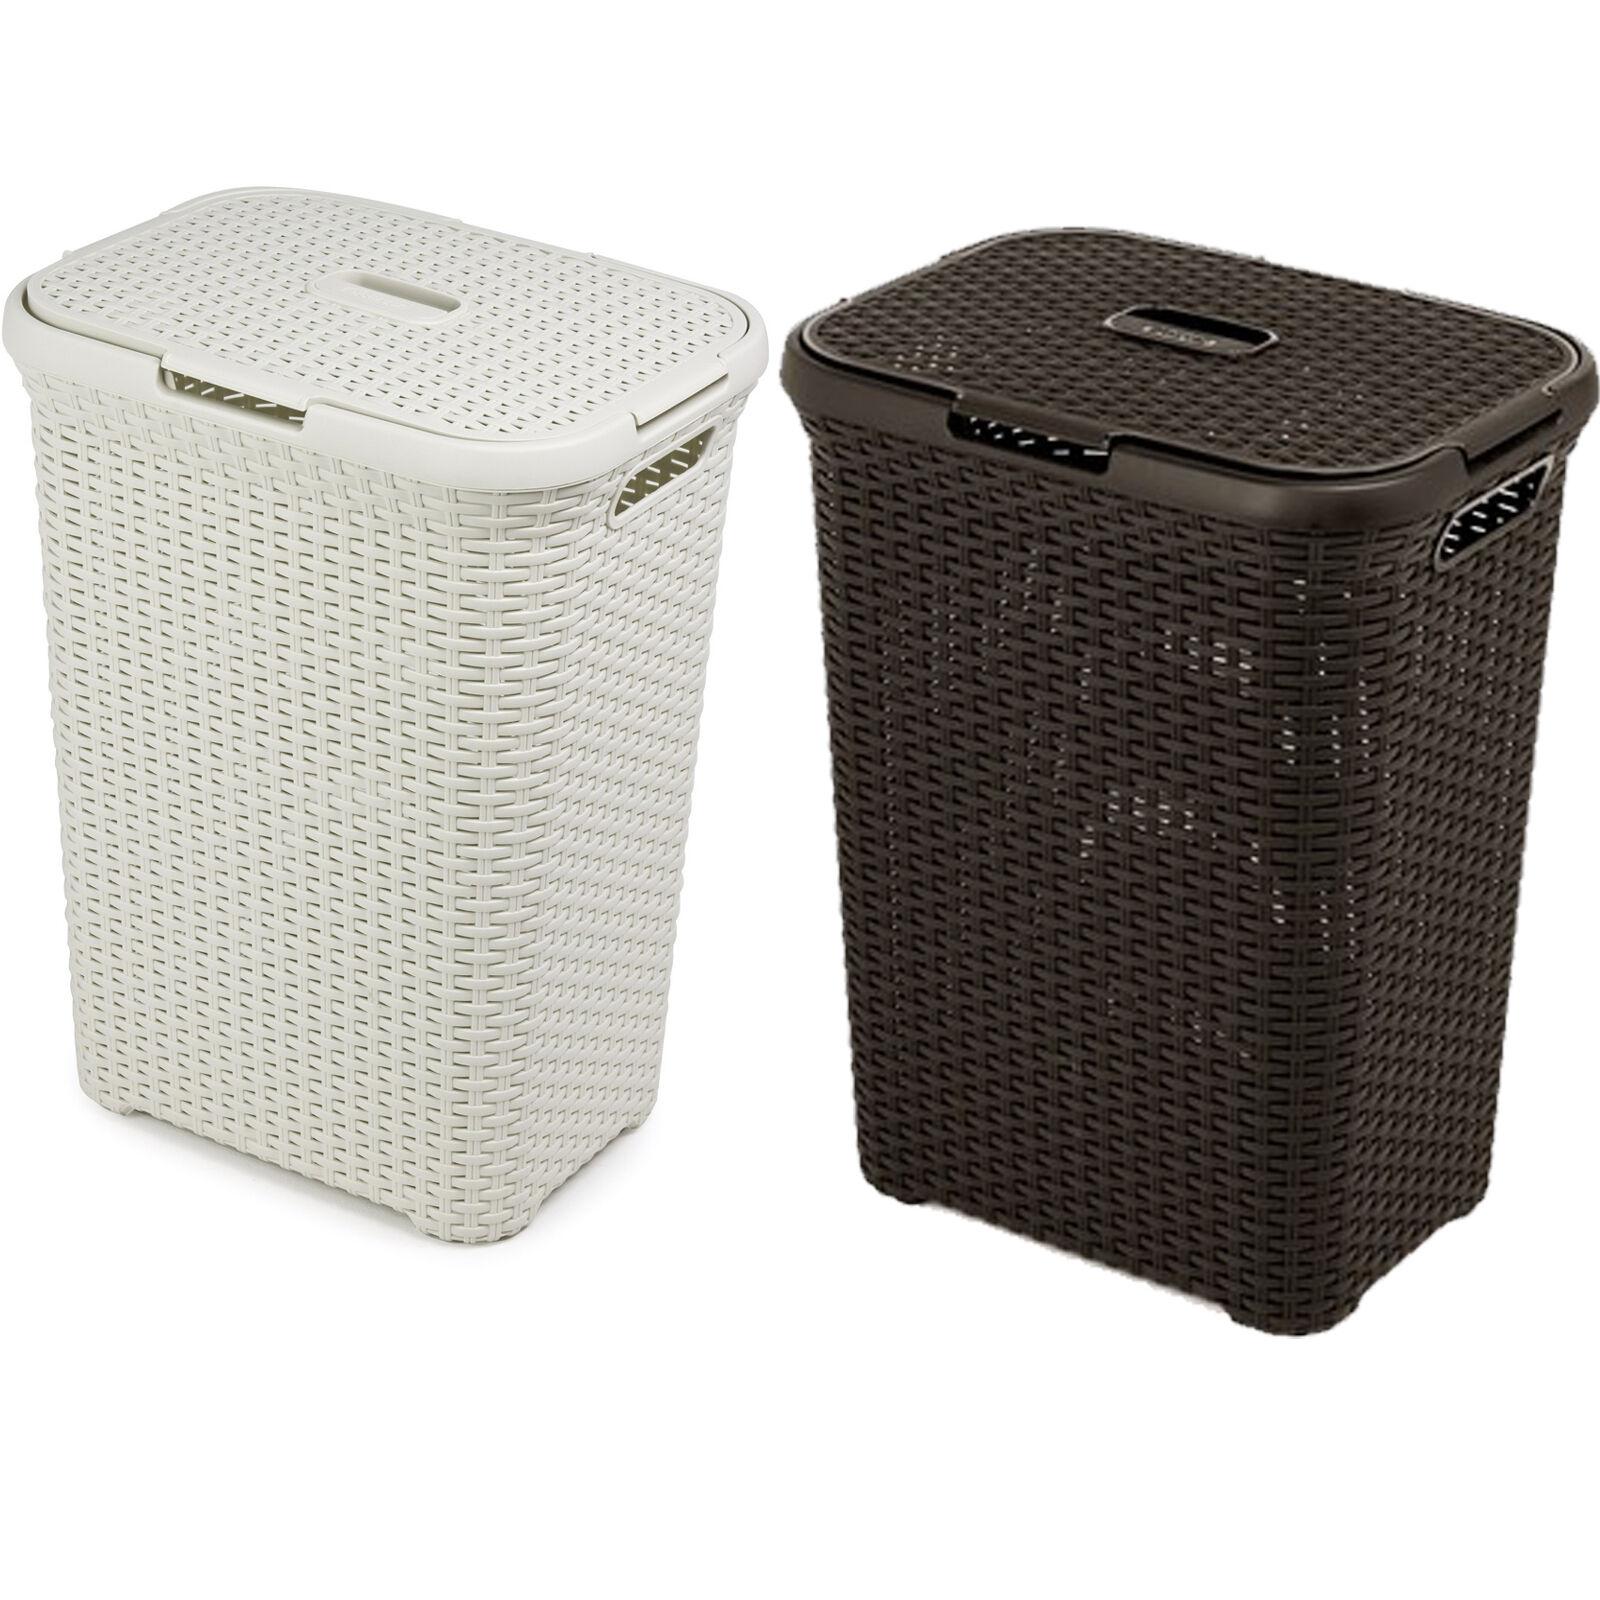 Rattan Design Laundry Bin Washing Basket Bucket Hamper